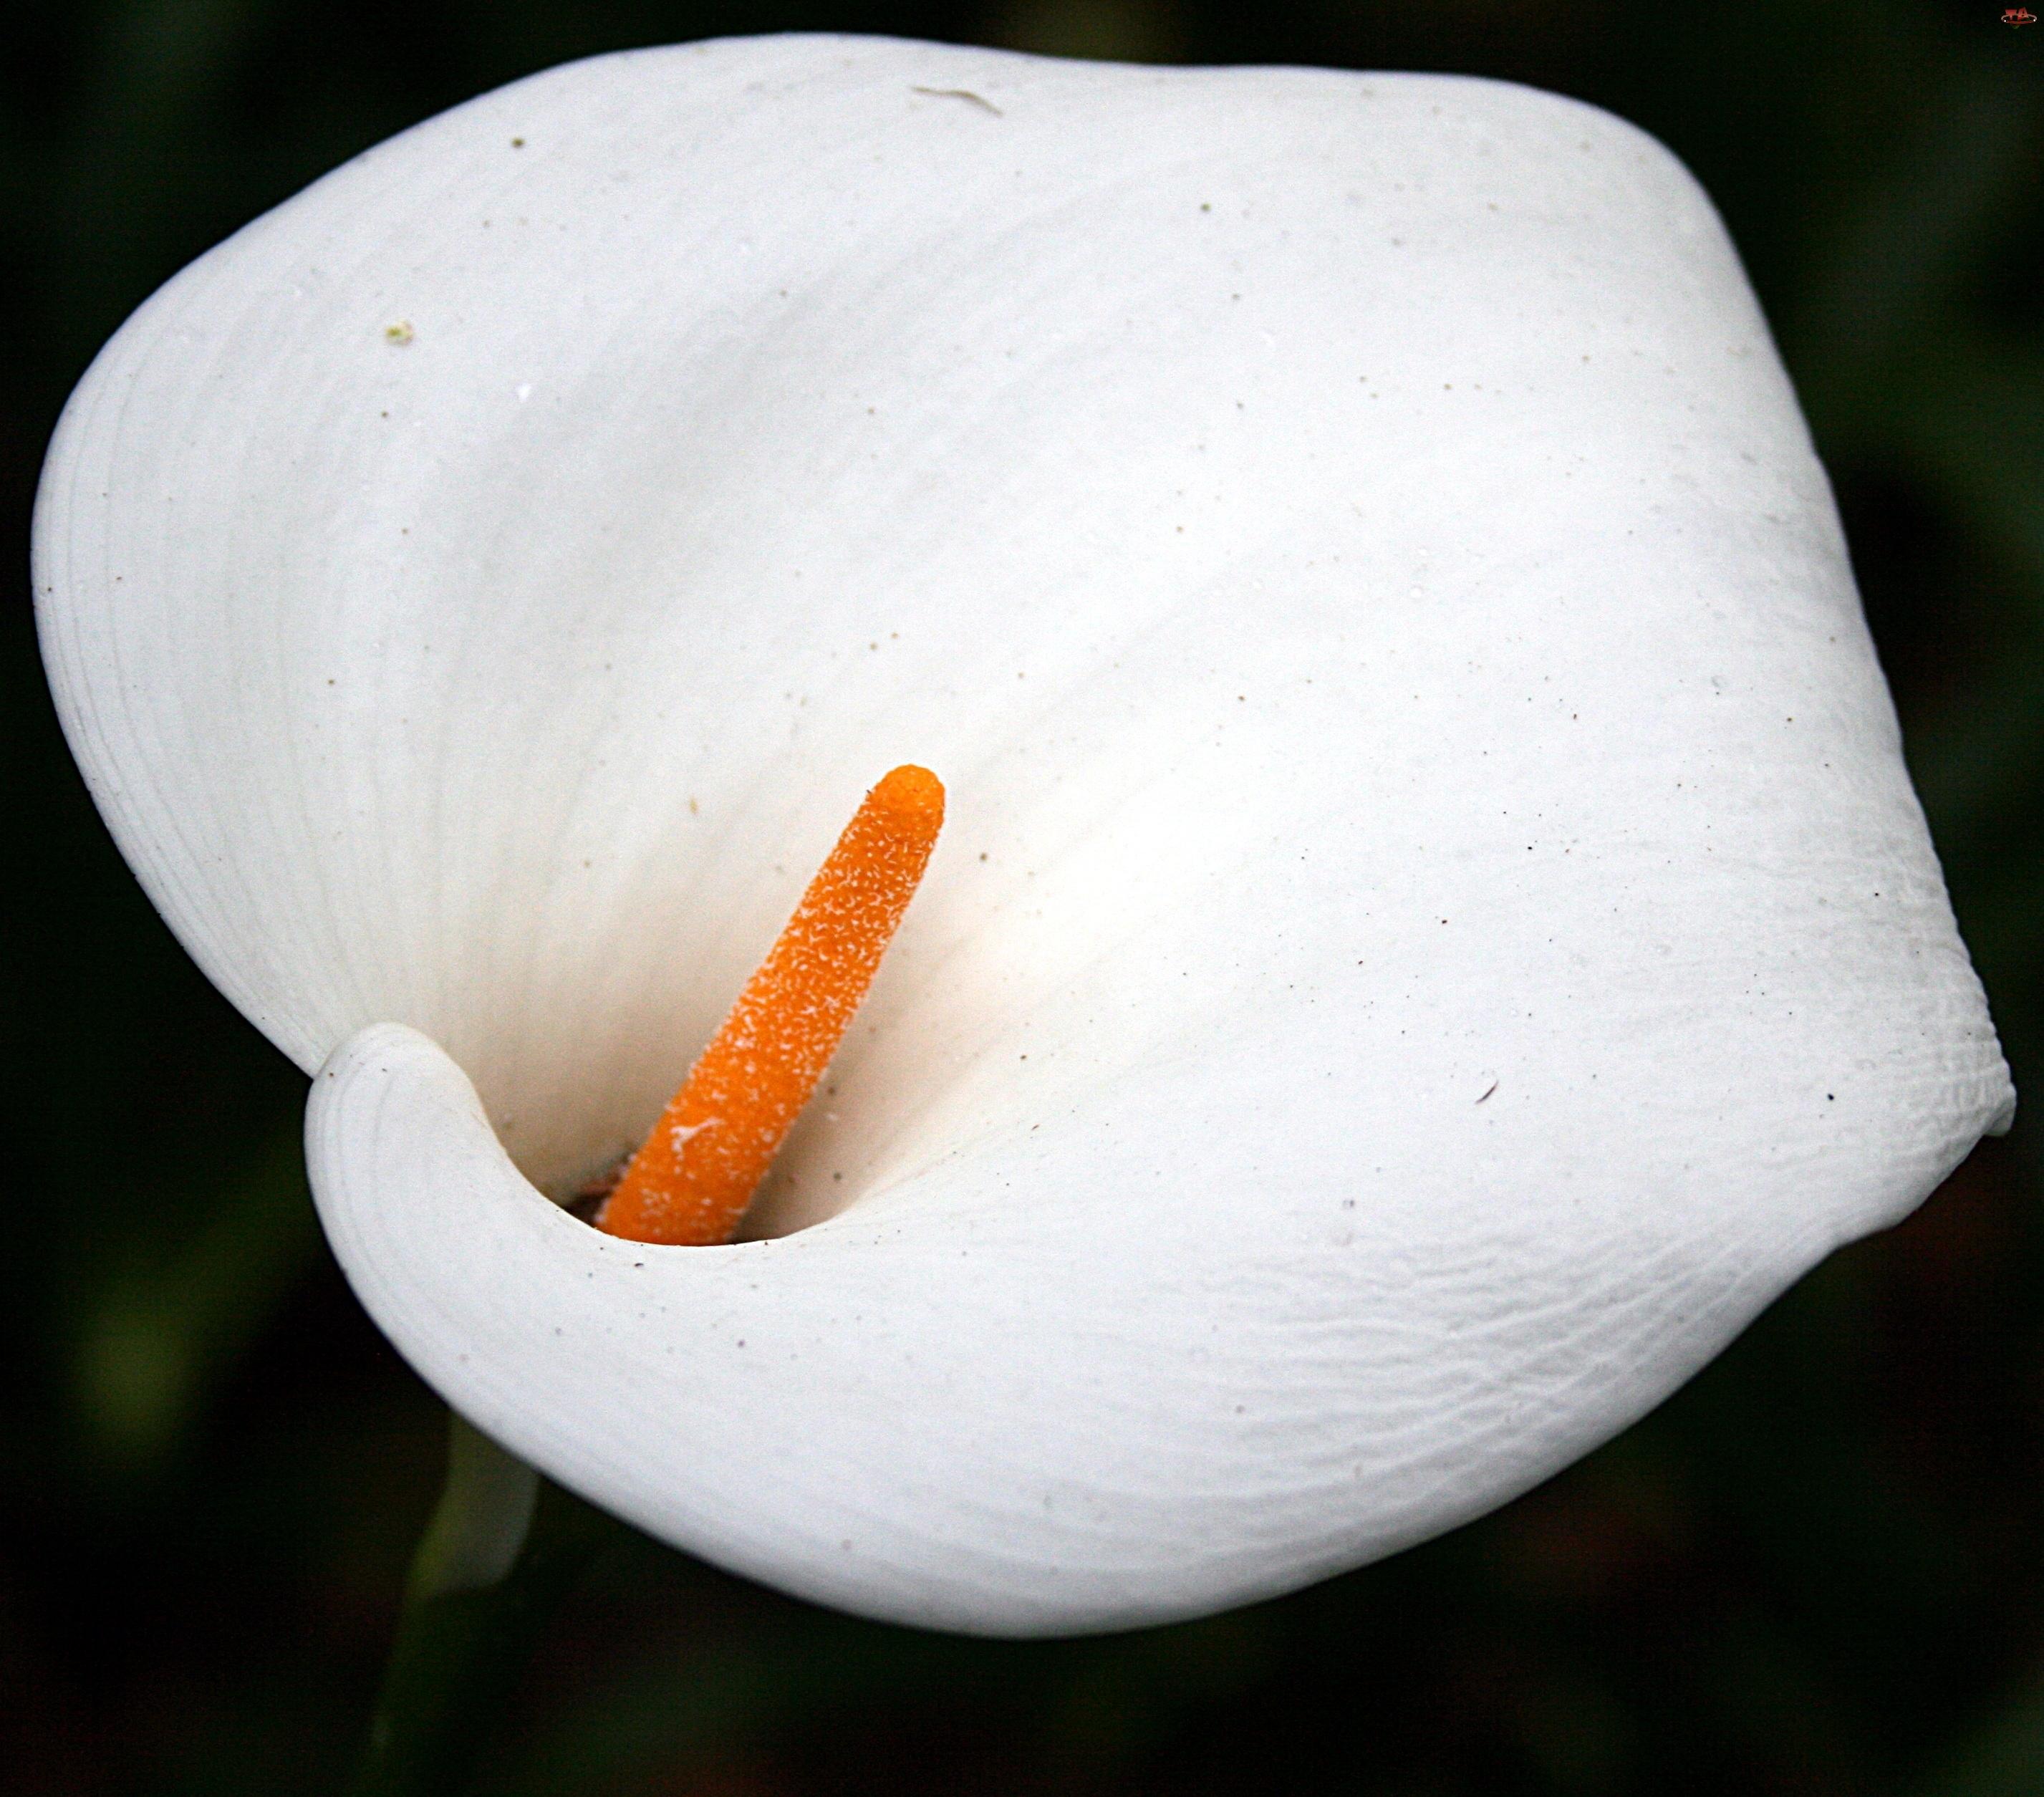 Kalia, Kwiat, Biała